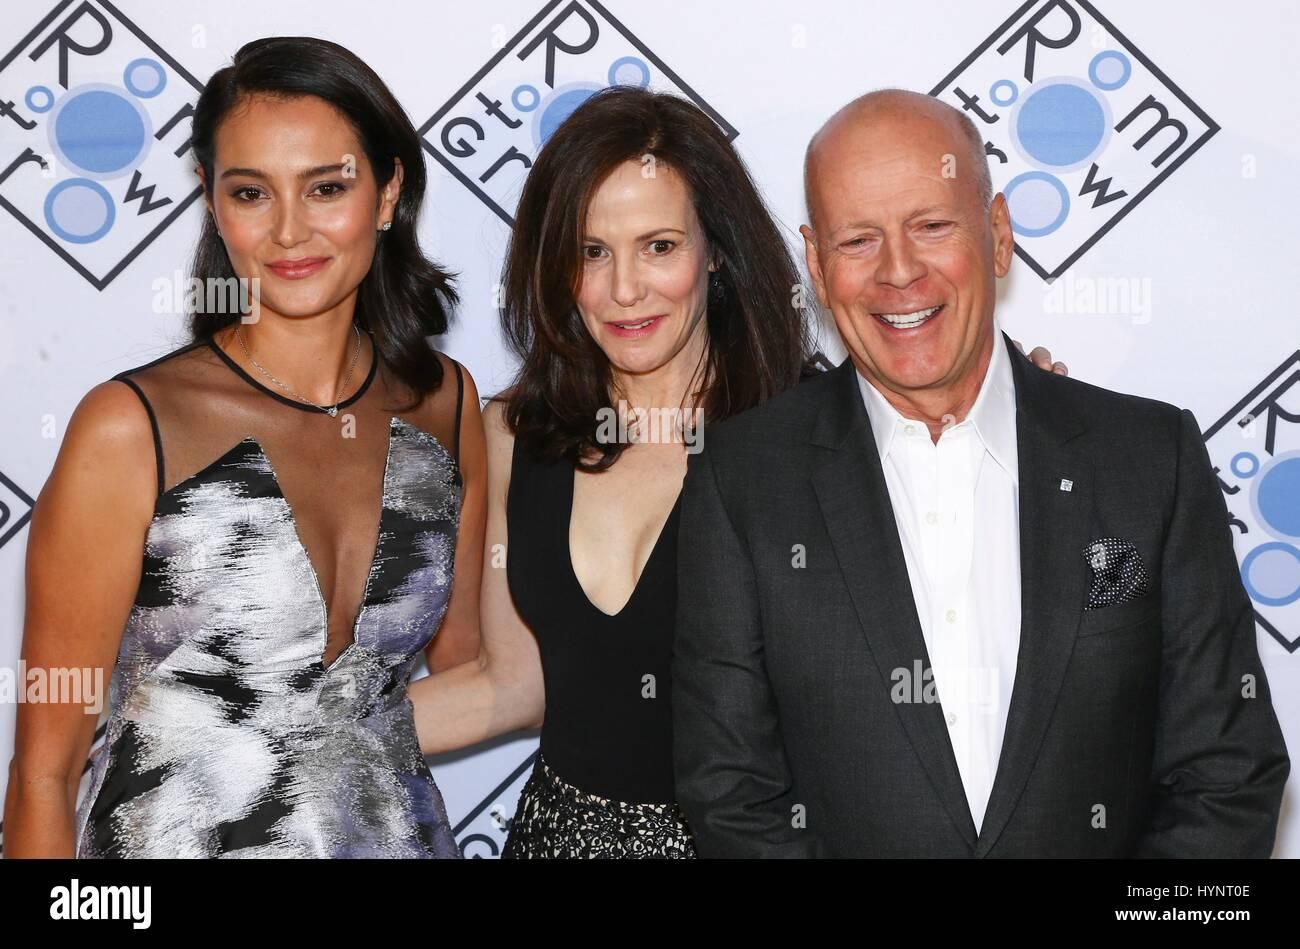 New York, NY, STATI UNITI D'AMERICA. 5 apr, 2017. Emma Hemming-Willis, Mary-Louise Parker, Bruce Willis presso Immagini Stock